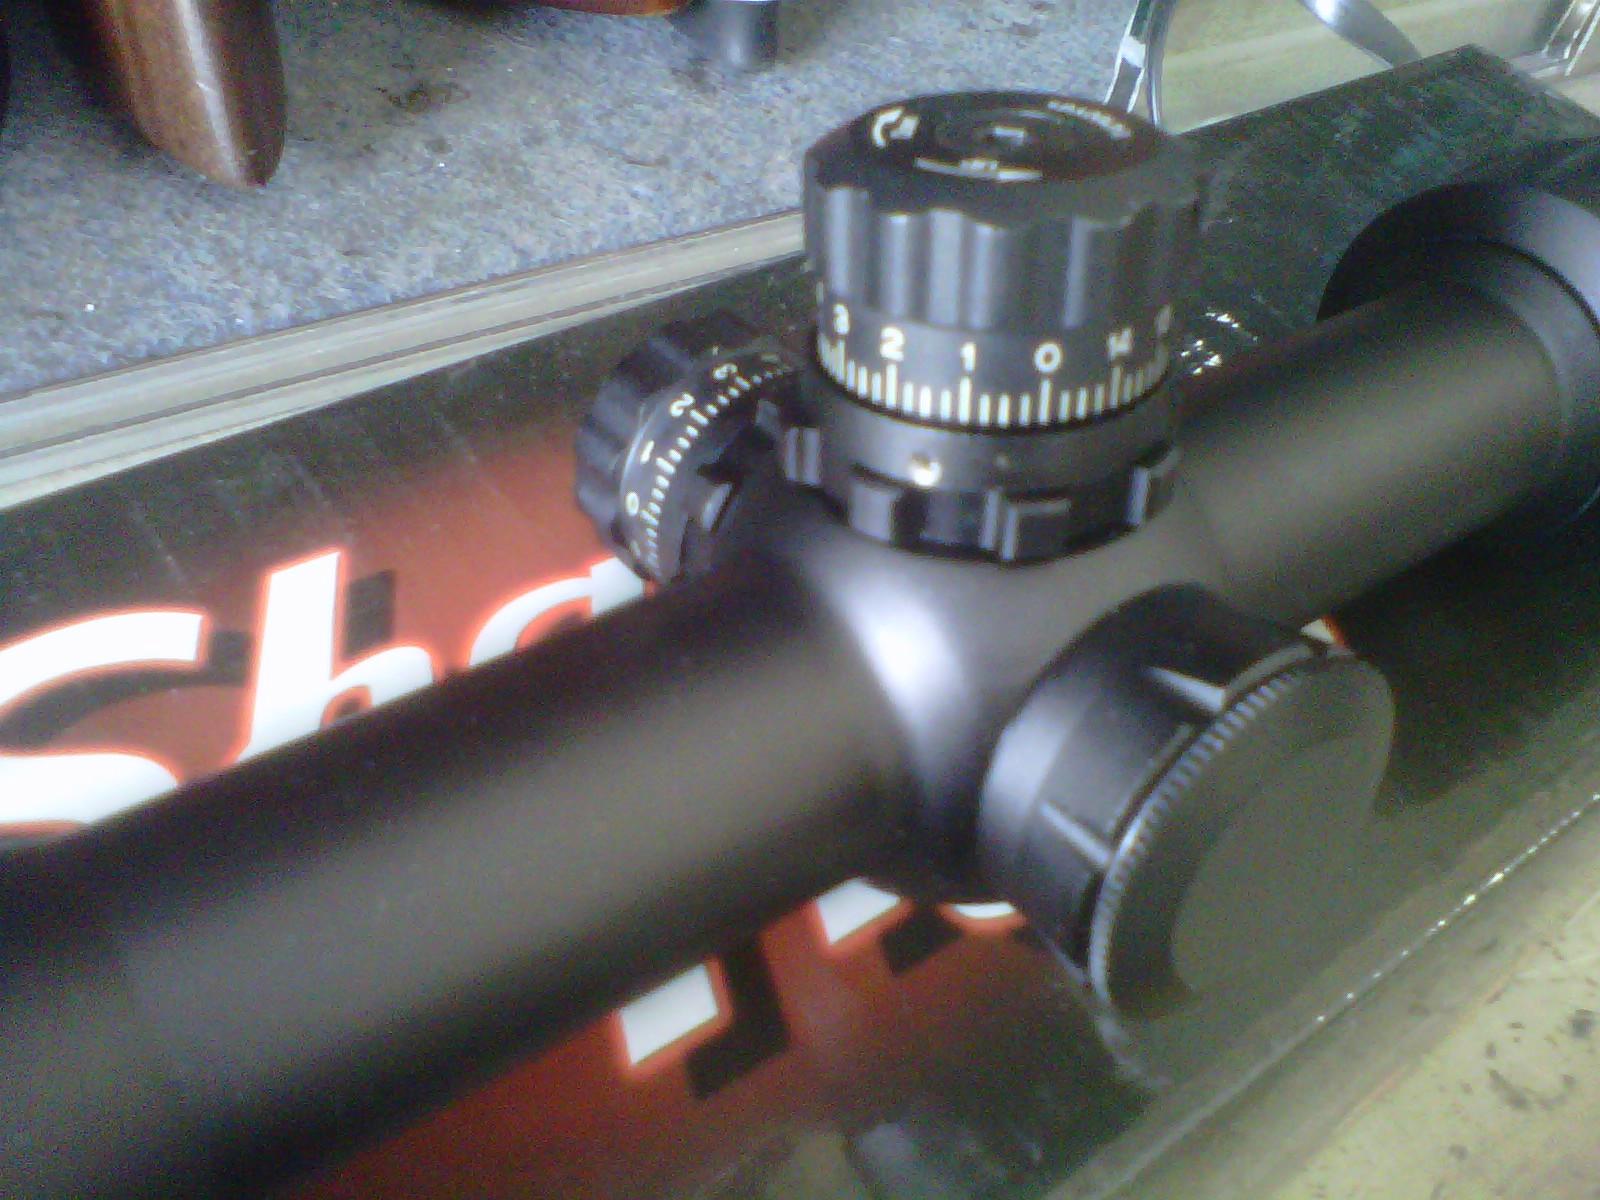 Teleskop senapan angin sharp tiger oprek bedil senapan pompa yg